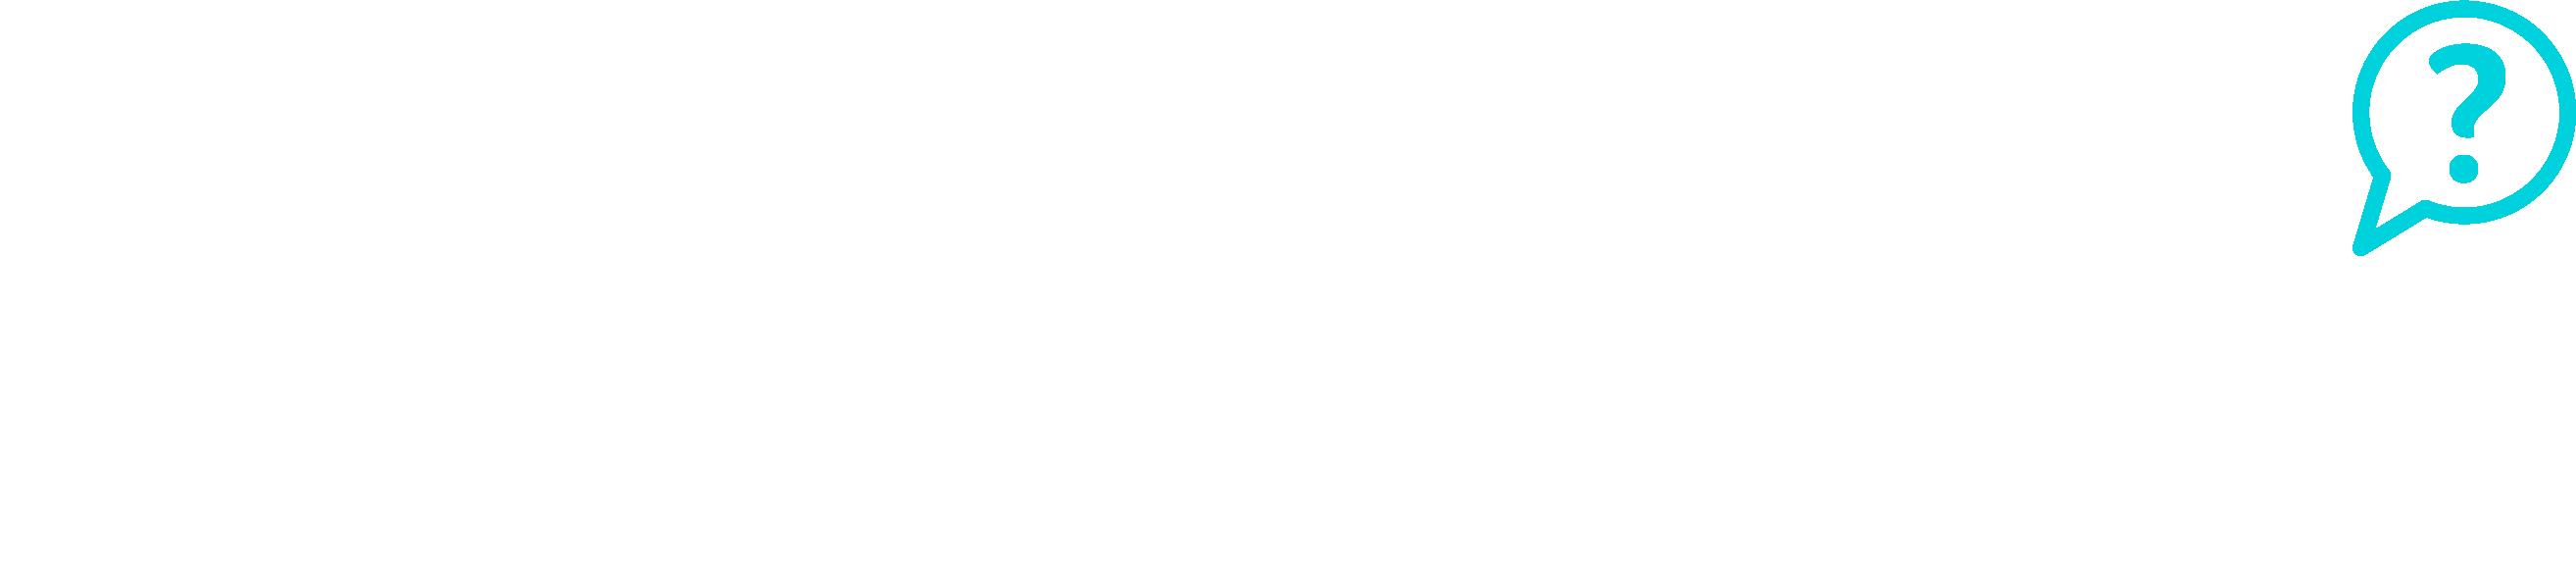 LegalQuery logo